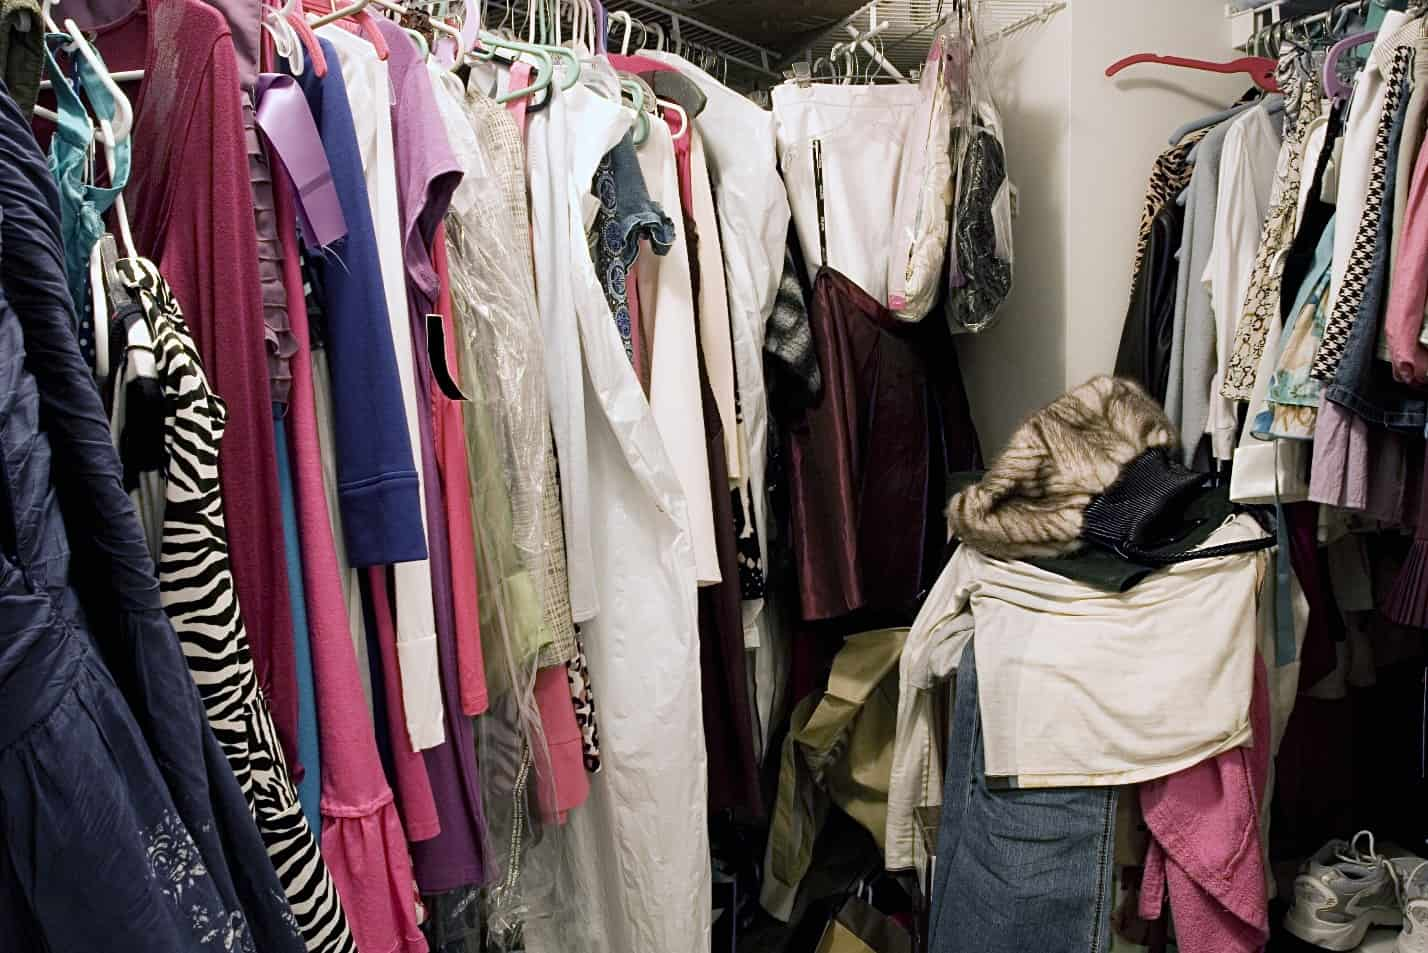 A messy closet full of clothes.